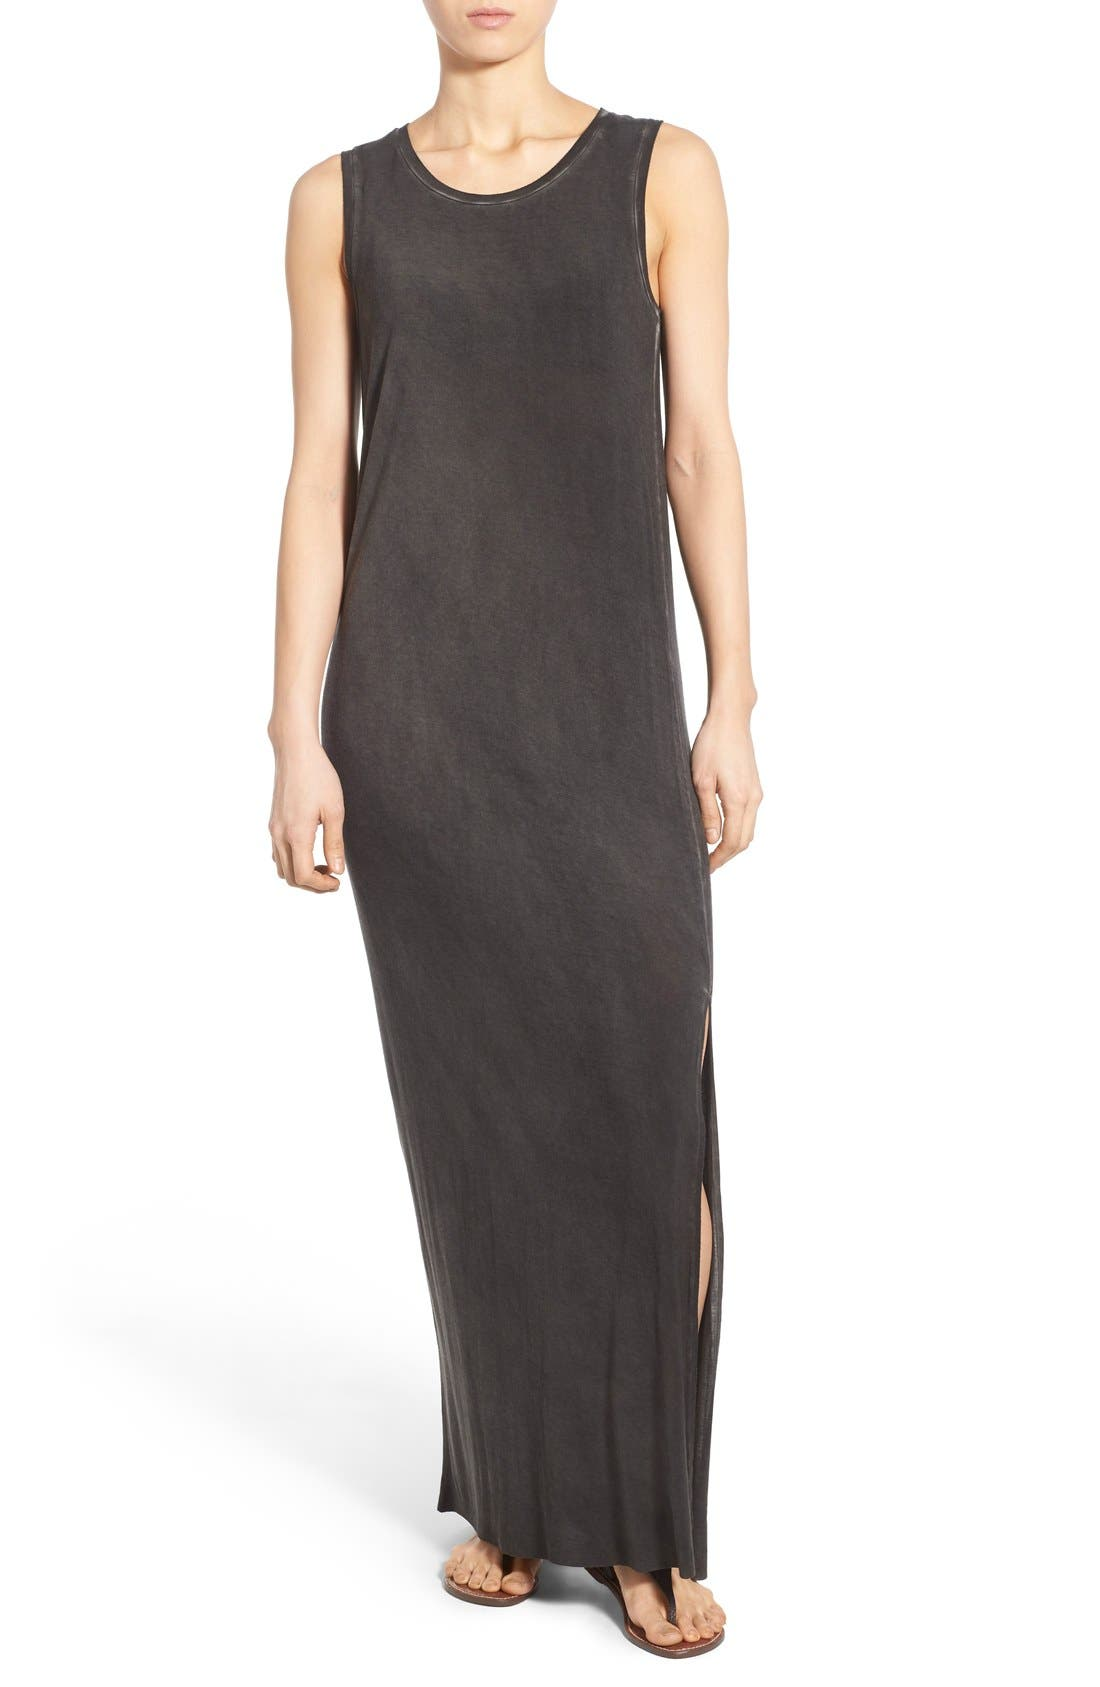 Main Image - PAIGE 'Gretchen' Maxi Dress